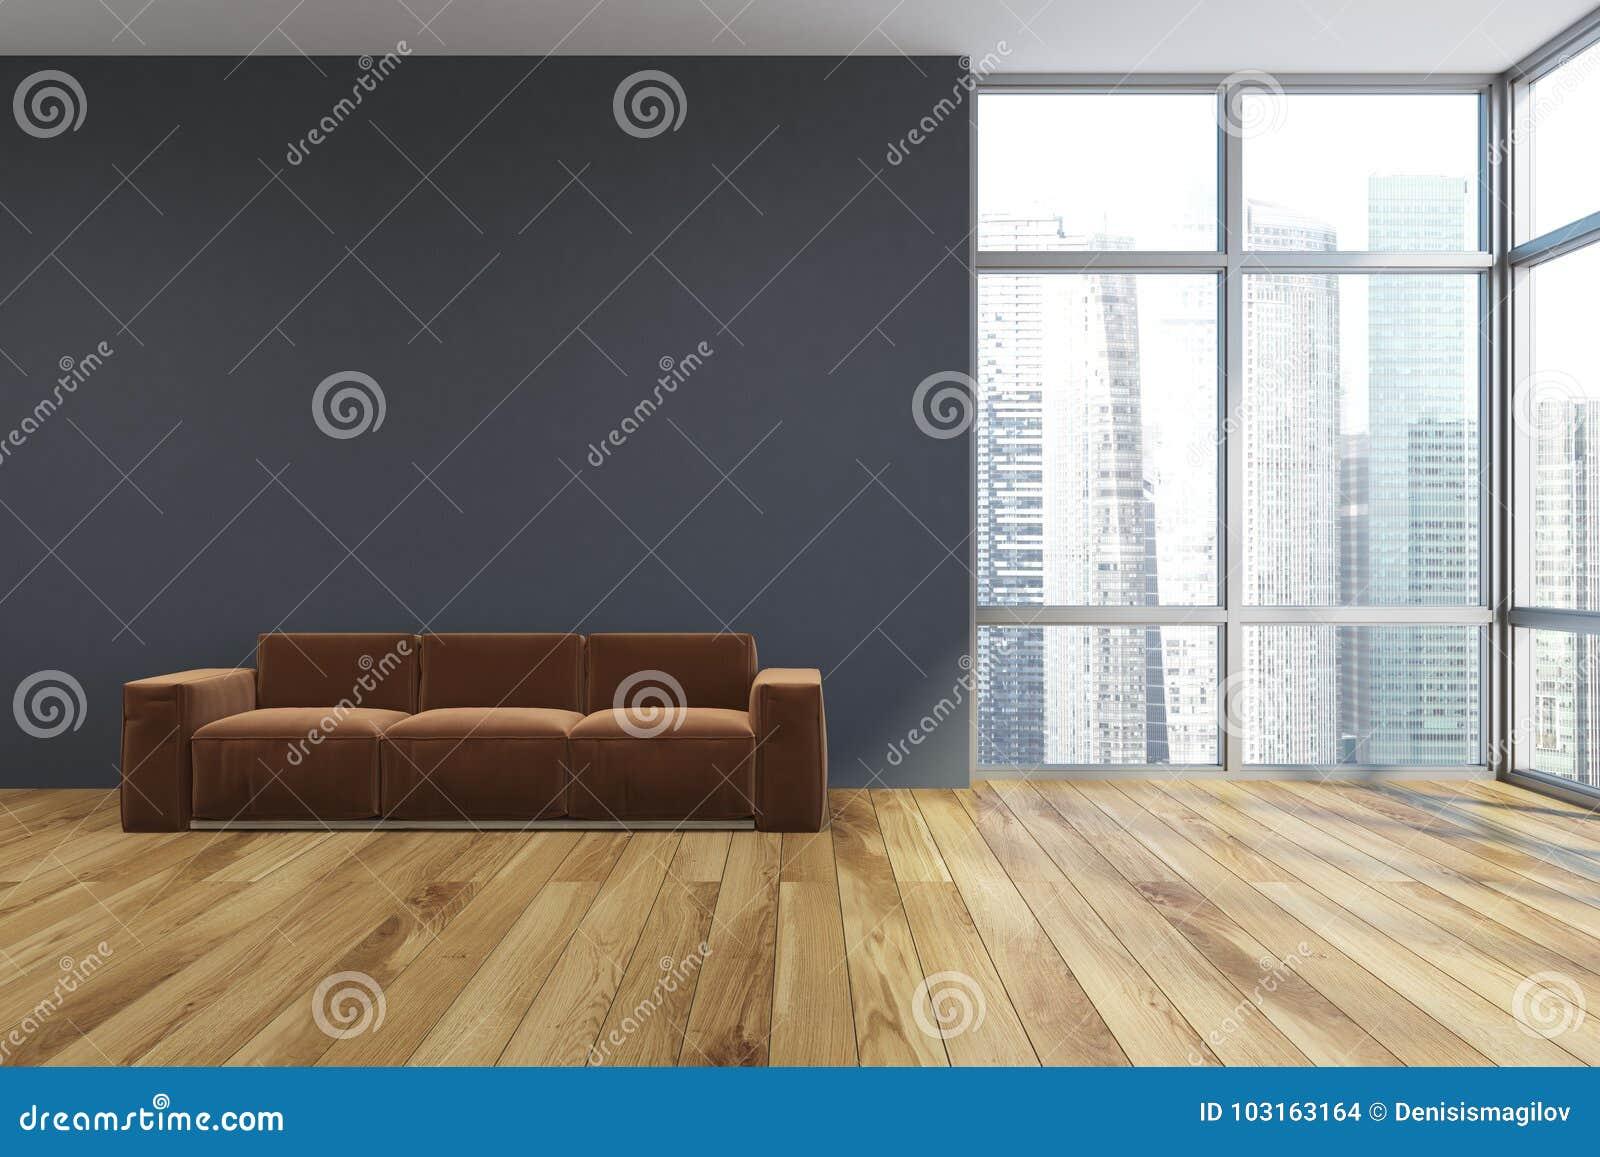 Empty Gray Living Room Brown Sofa Stock Illustration